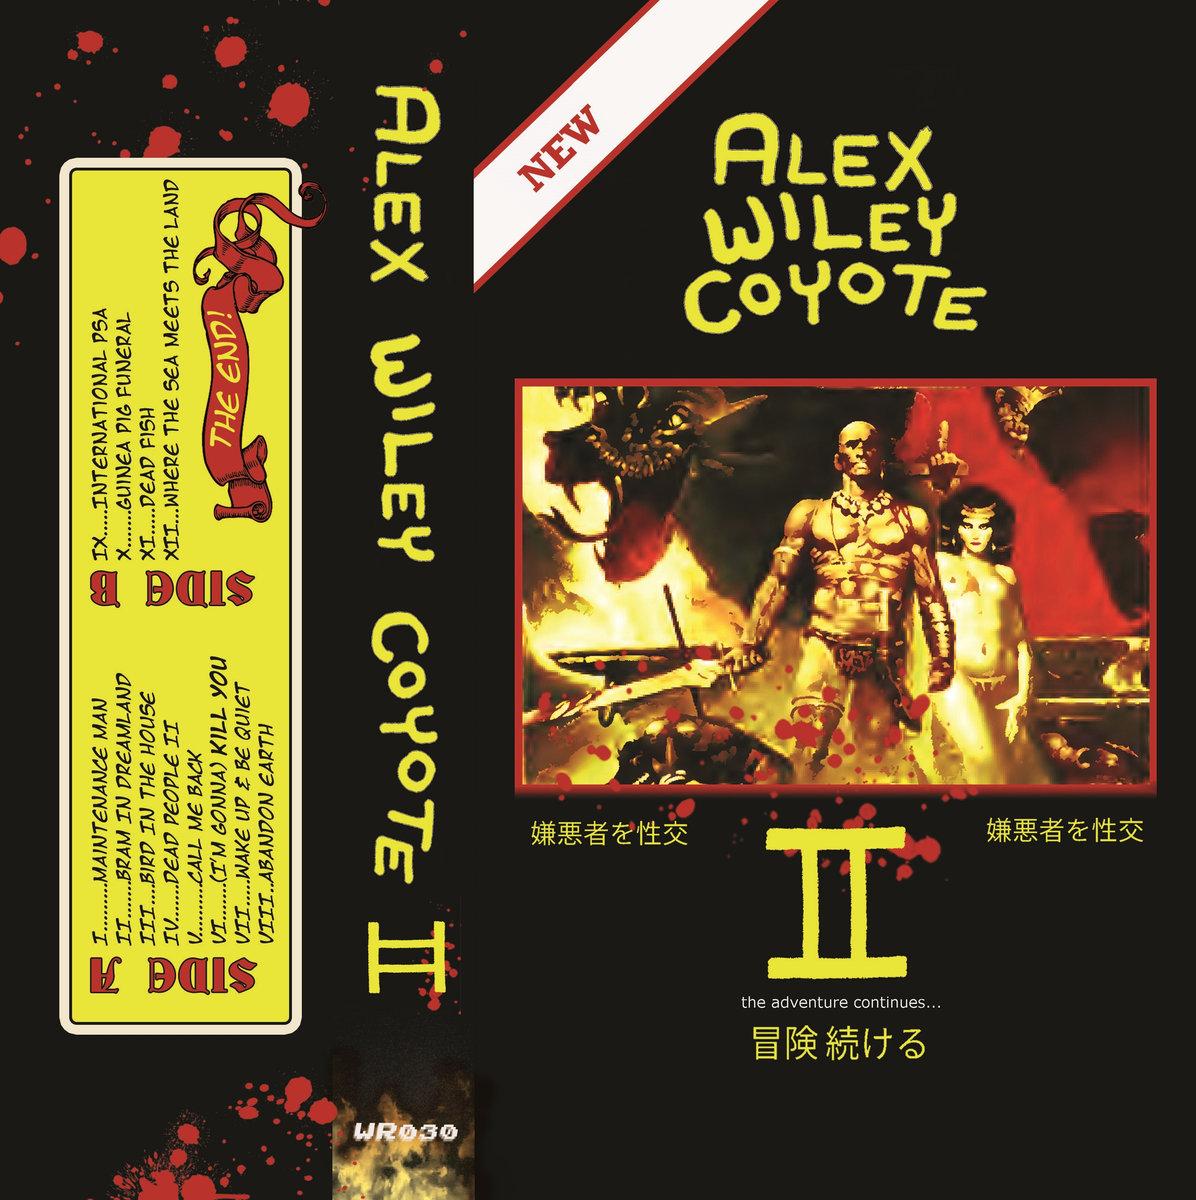 Alex Wiley Coyote II